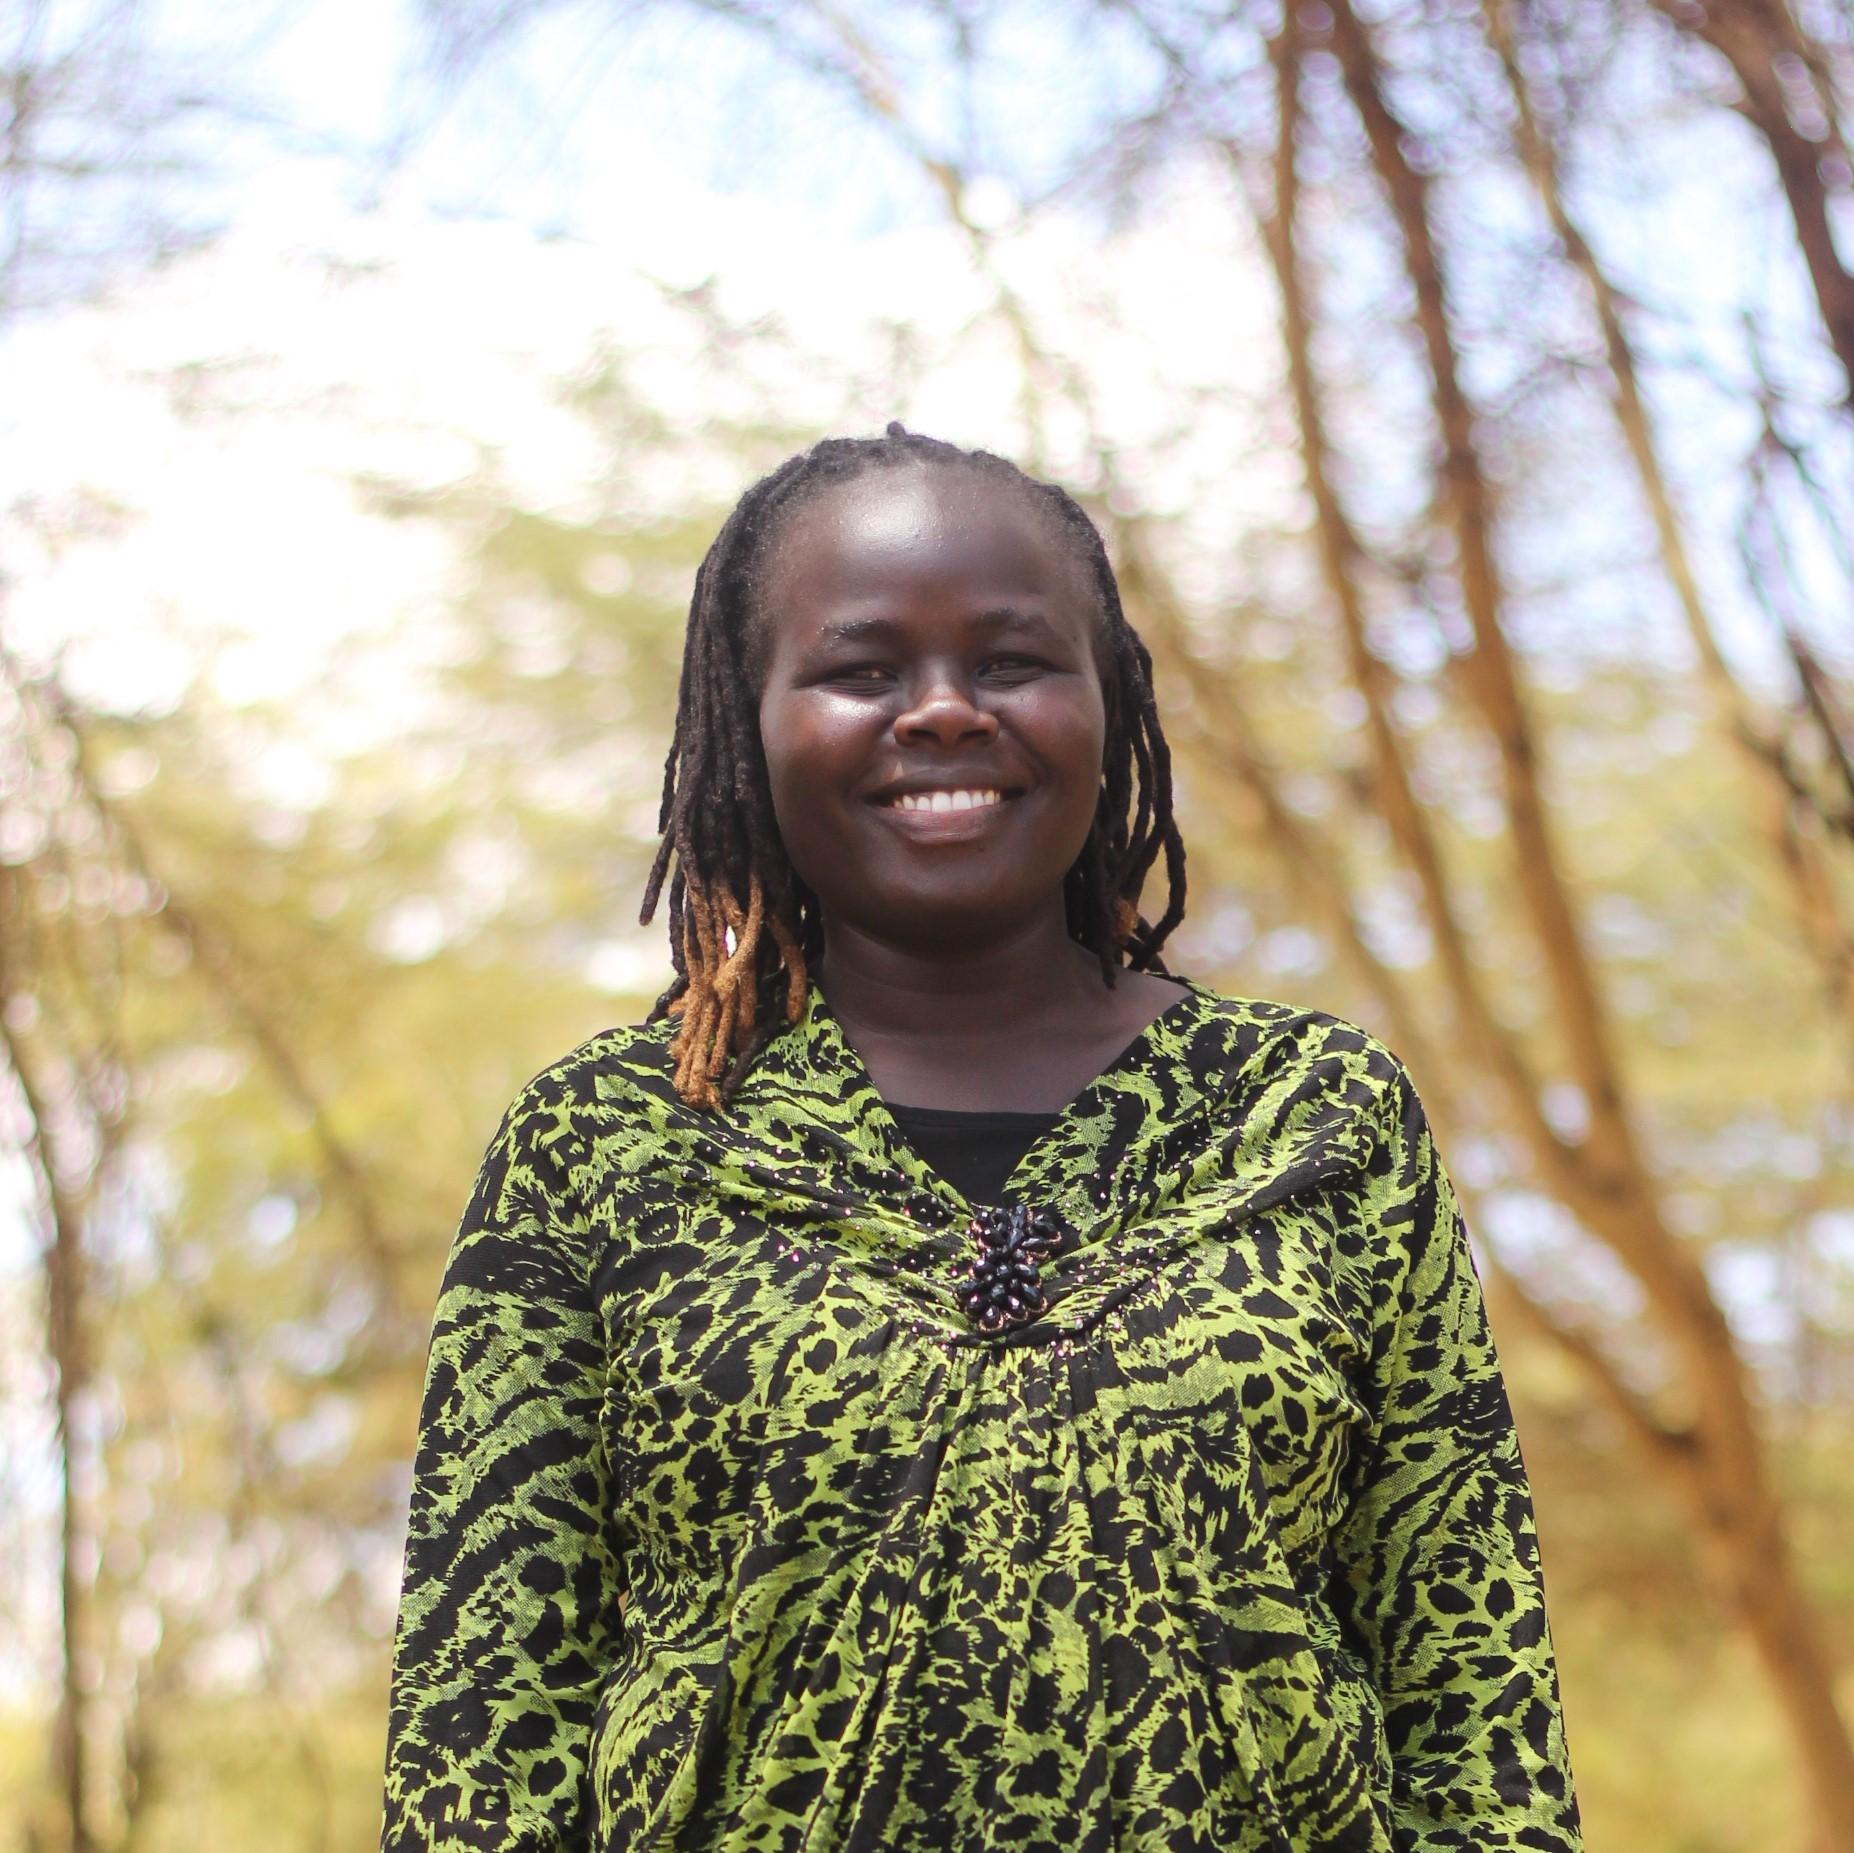 Rebecca Kochulem. - NRT West Community Development Officer, & former manager of Ruko Community Conservancy.